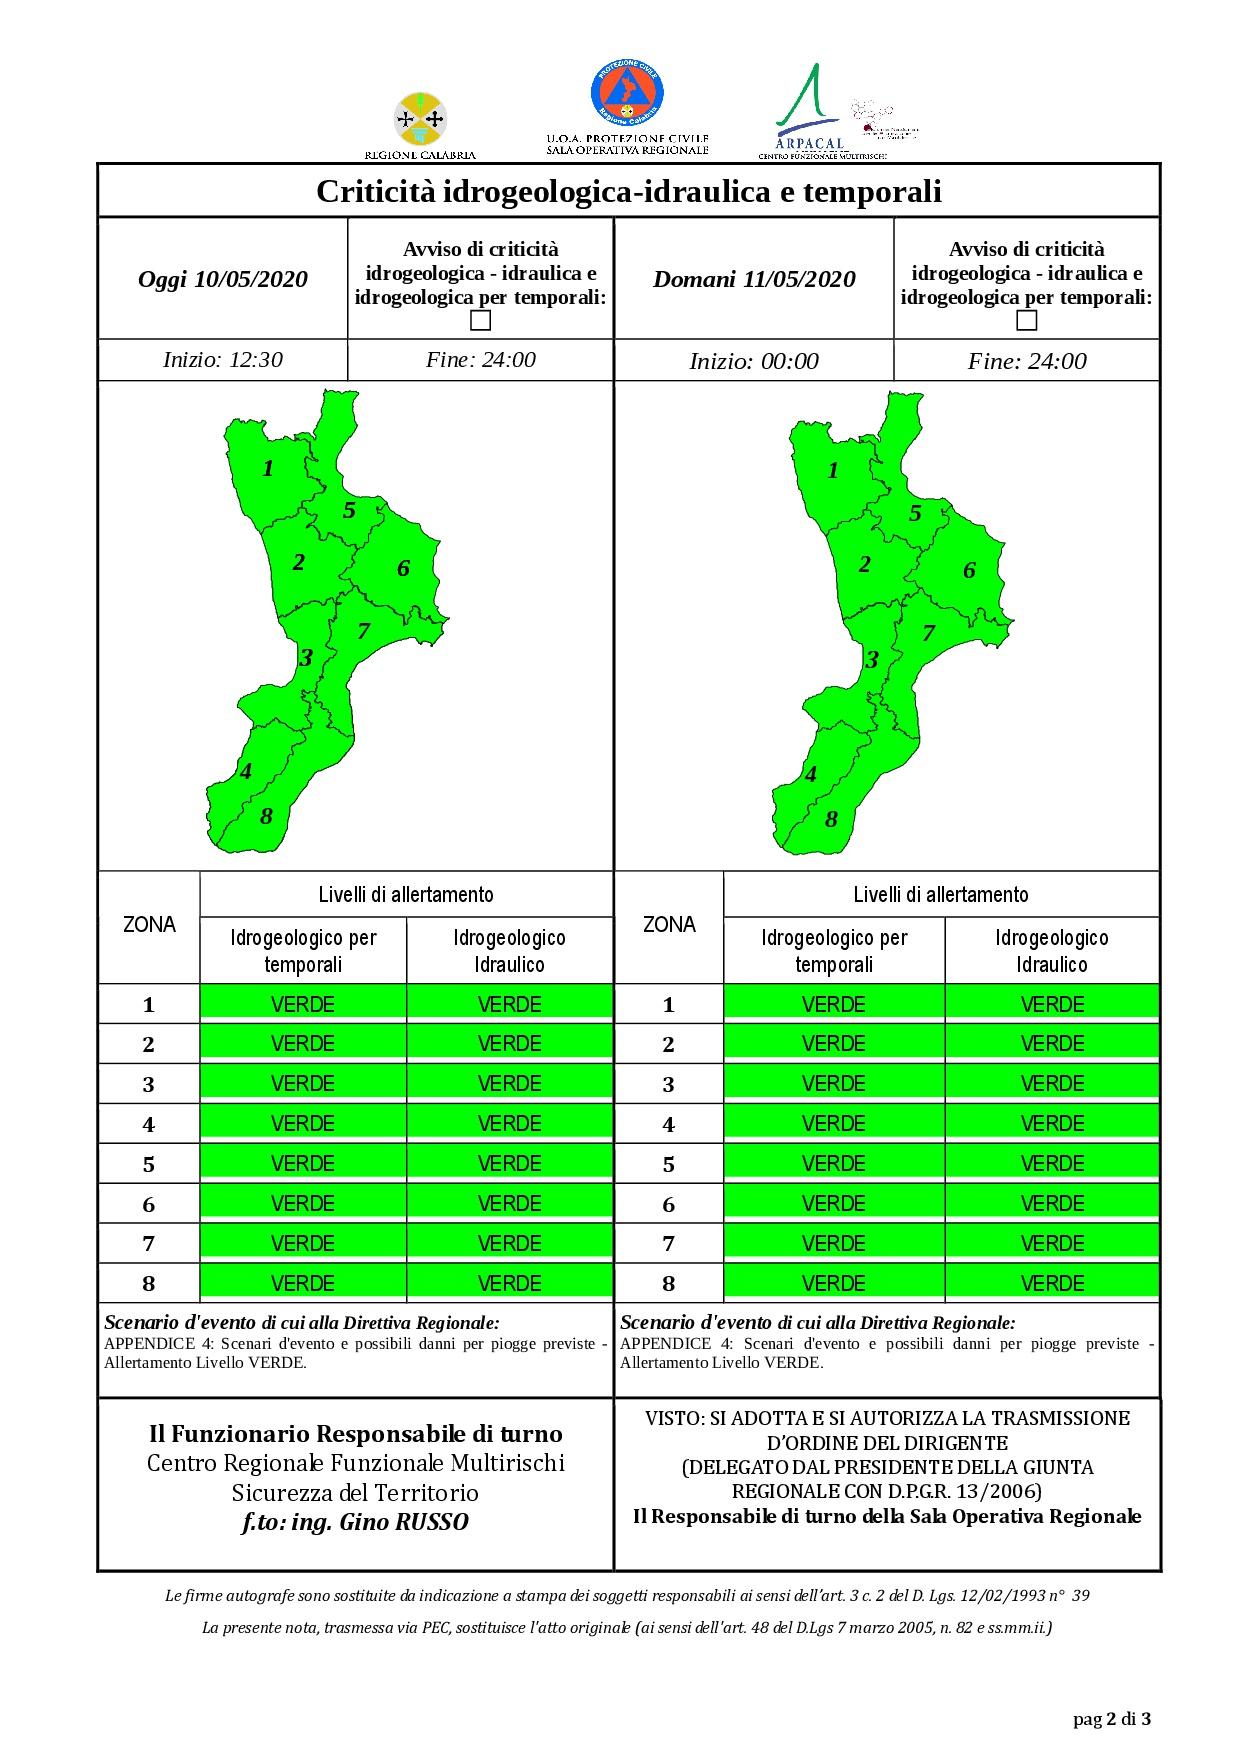 Criticità idrogeologica-idraulica e temporali in Calabria 10-05-2020